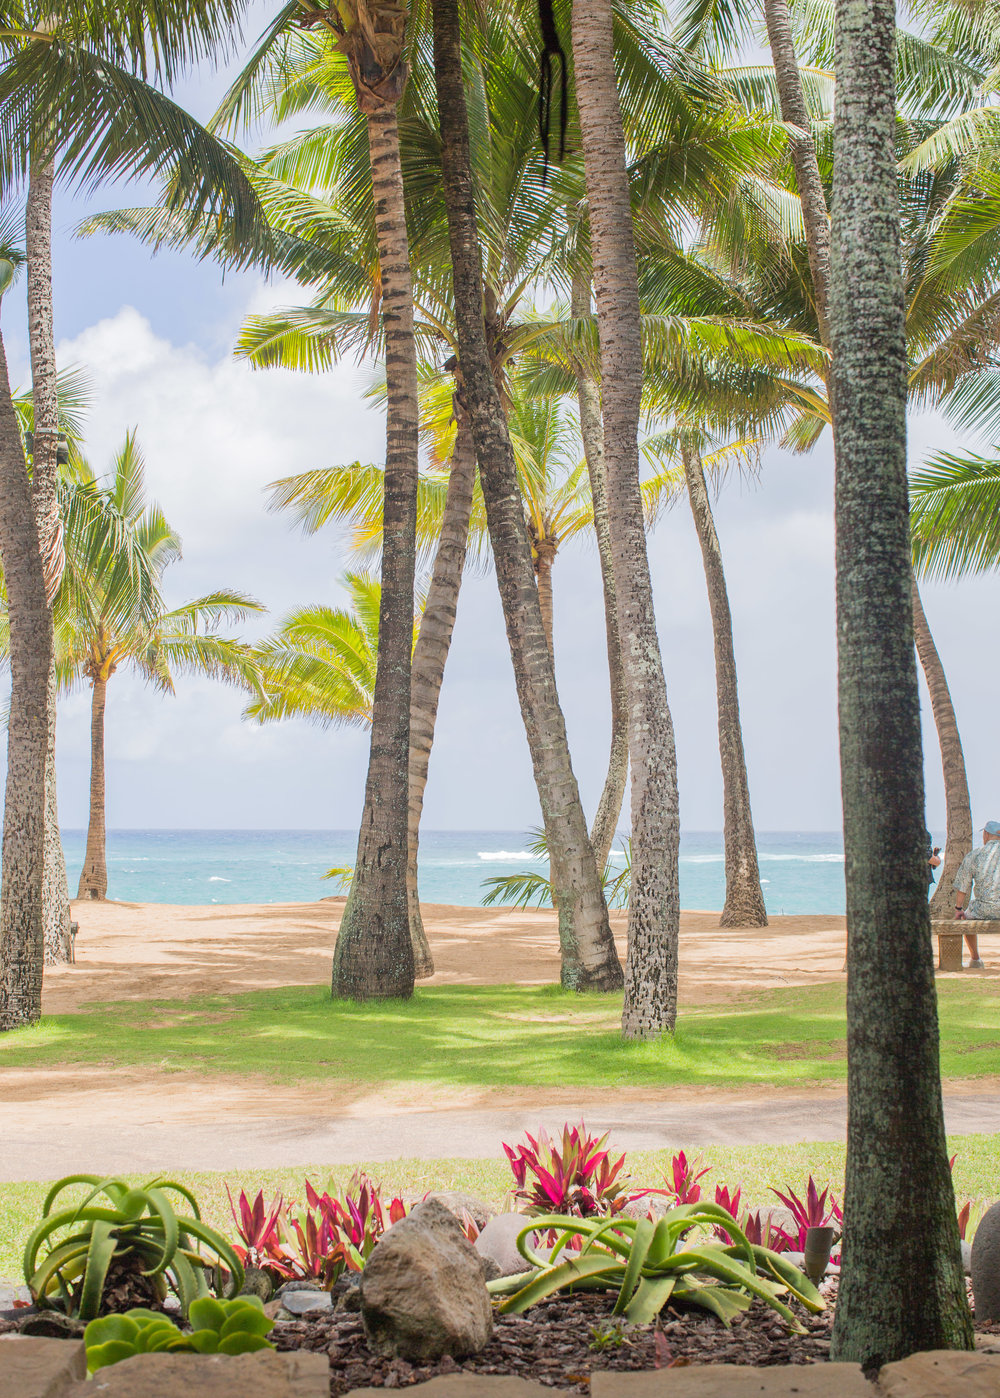 fizz-fade-hawaii-paia-4.jpg